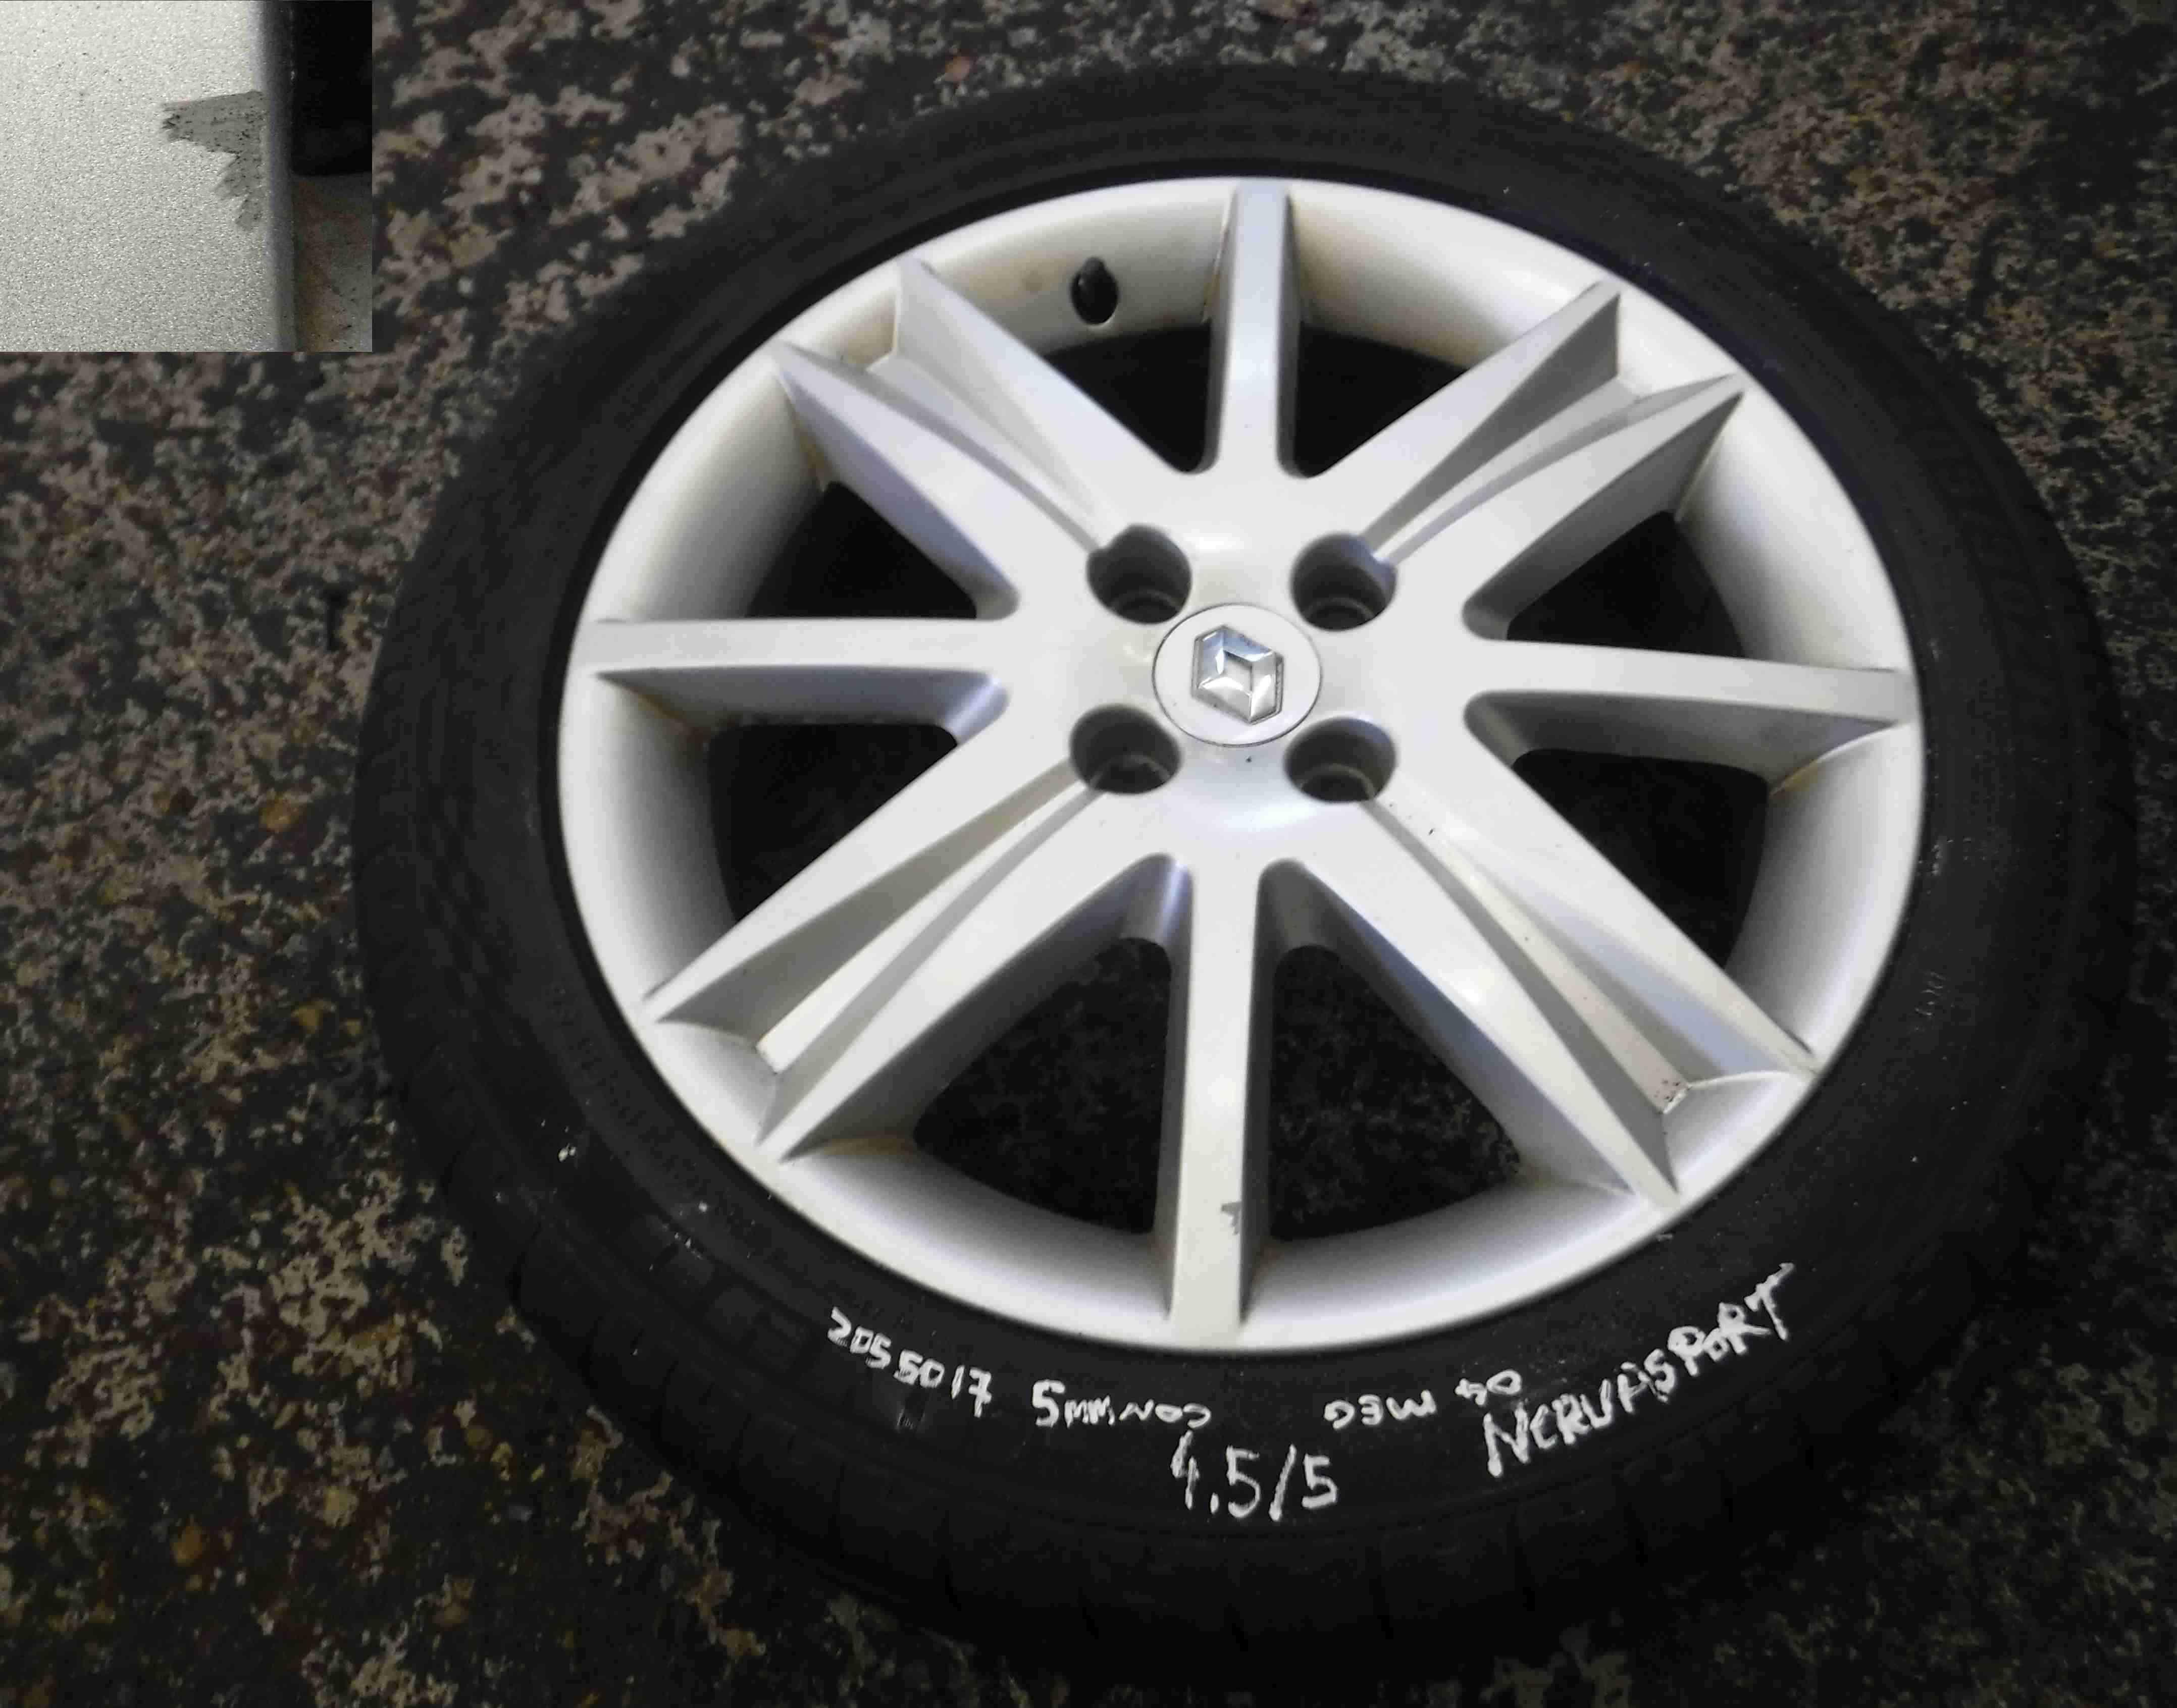 Renault Megane 2002-2008 Nervasport Alloy Wheel  Tyre 205 50 17 5mm Tread 35